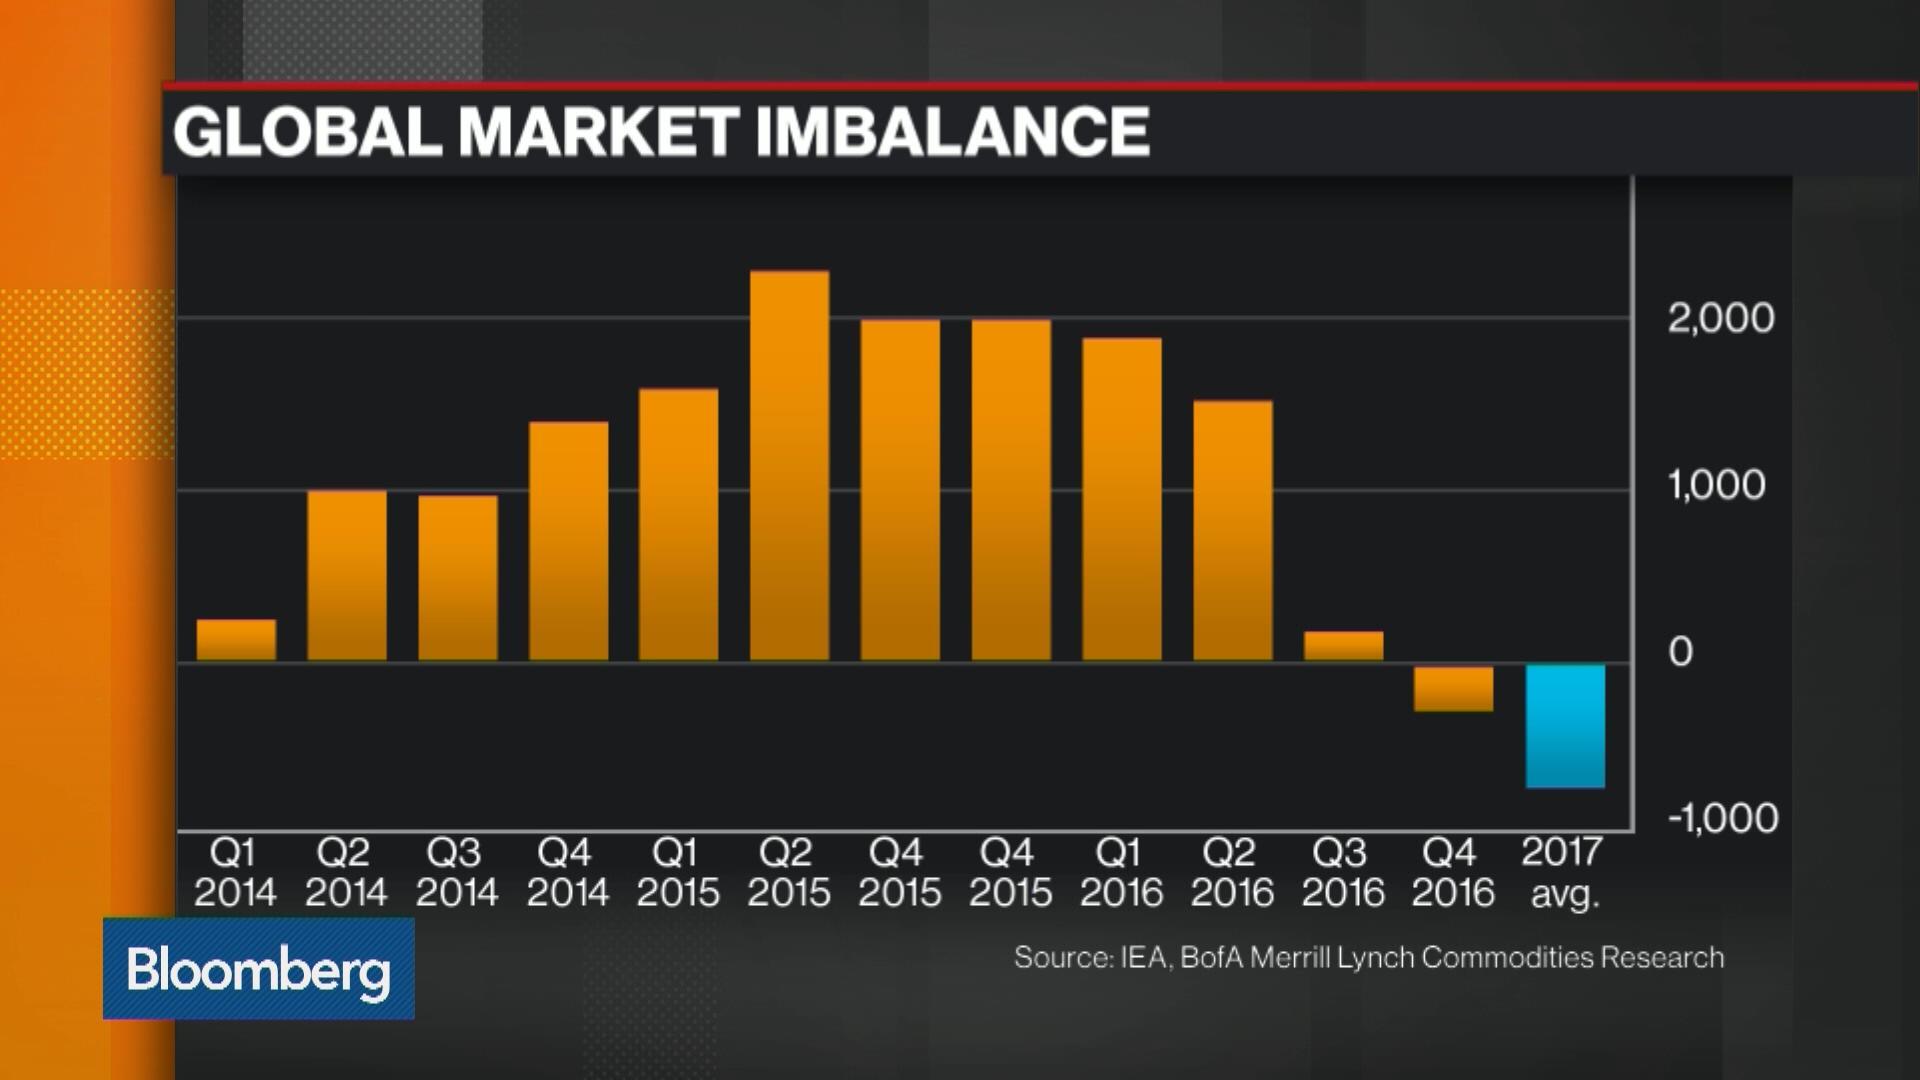 Oil Trims Weekly Gain as Surplus Persists Despite Supply Losses - Bloomberg